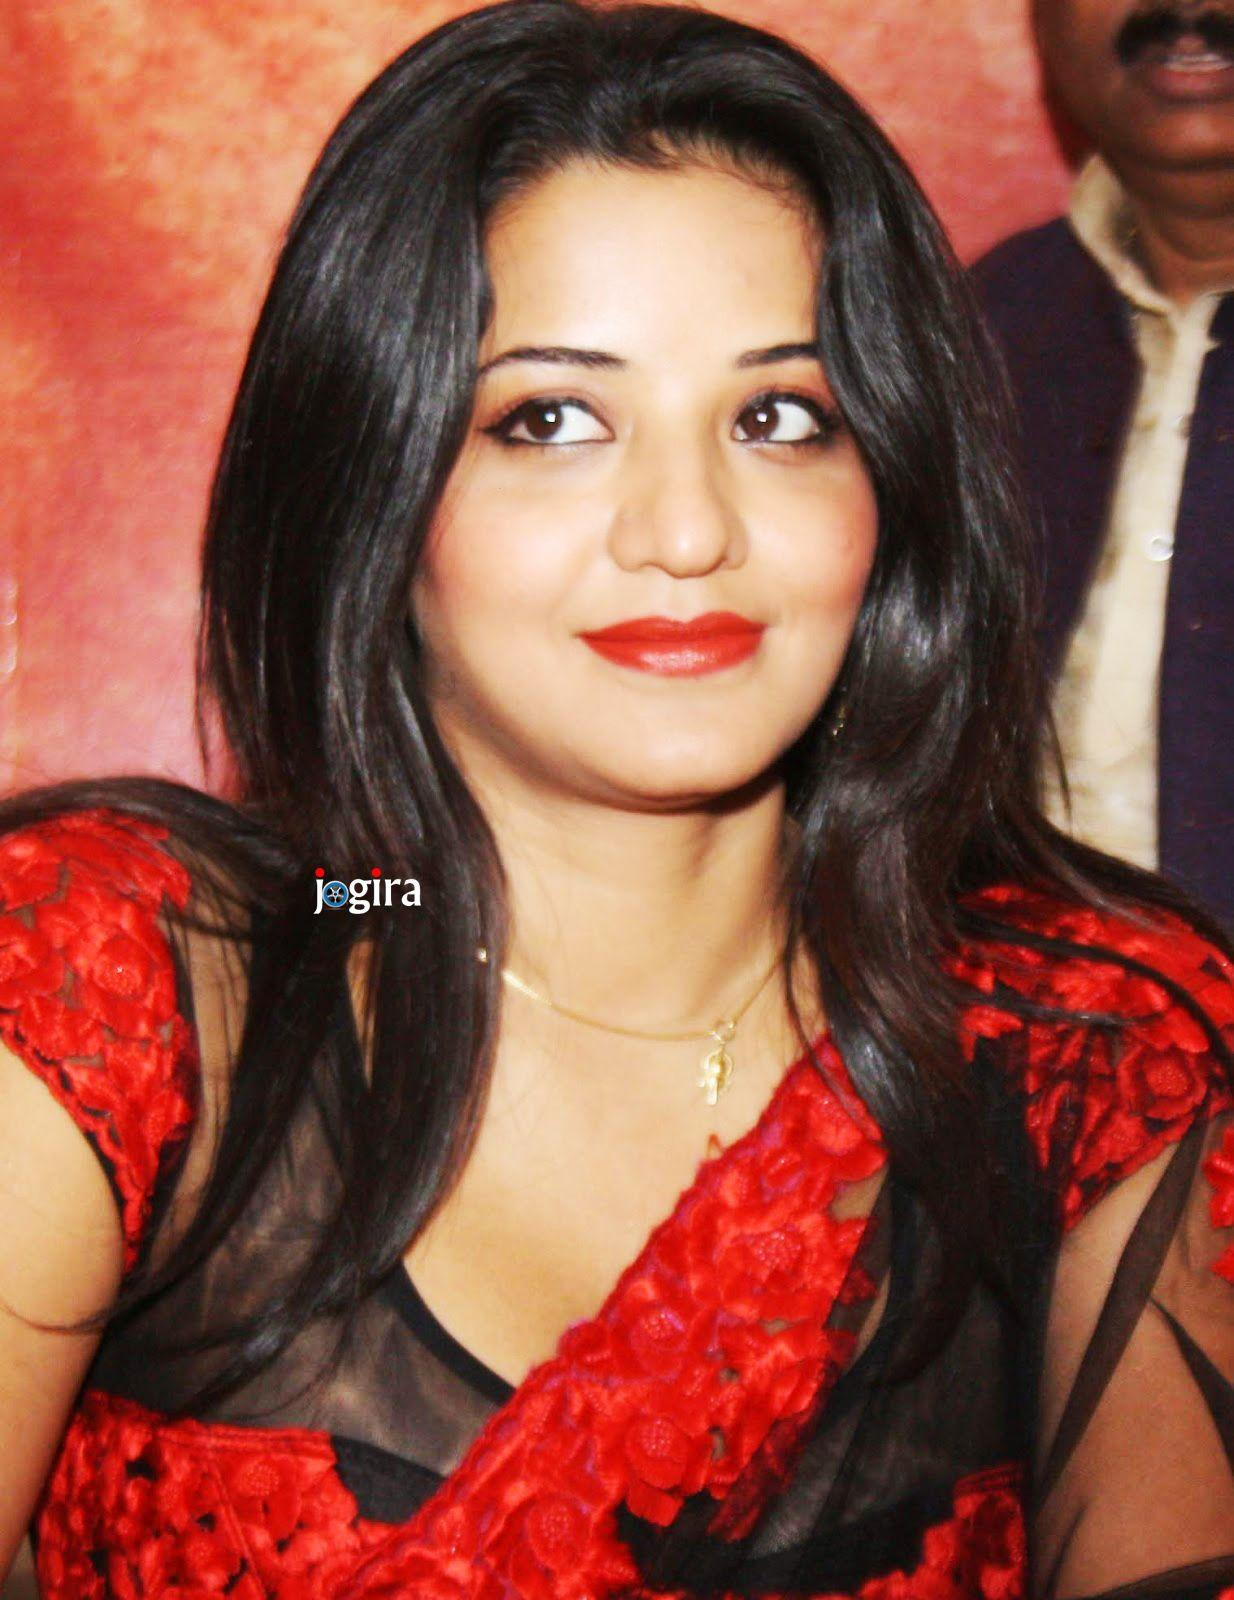 Mona lisa hd wallpapers wallpaper cave monalisa bhojpuri actress hd wallpapers image gallery beautiful thecheapjerseys Choice Image